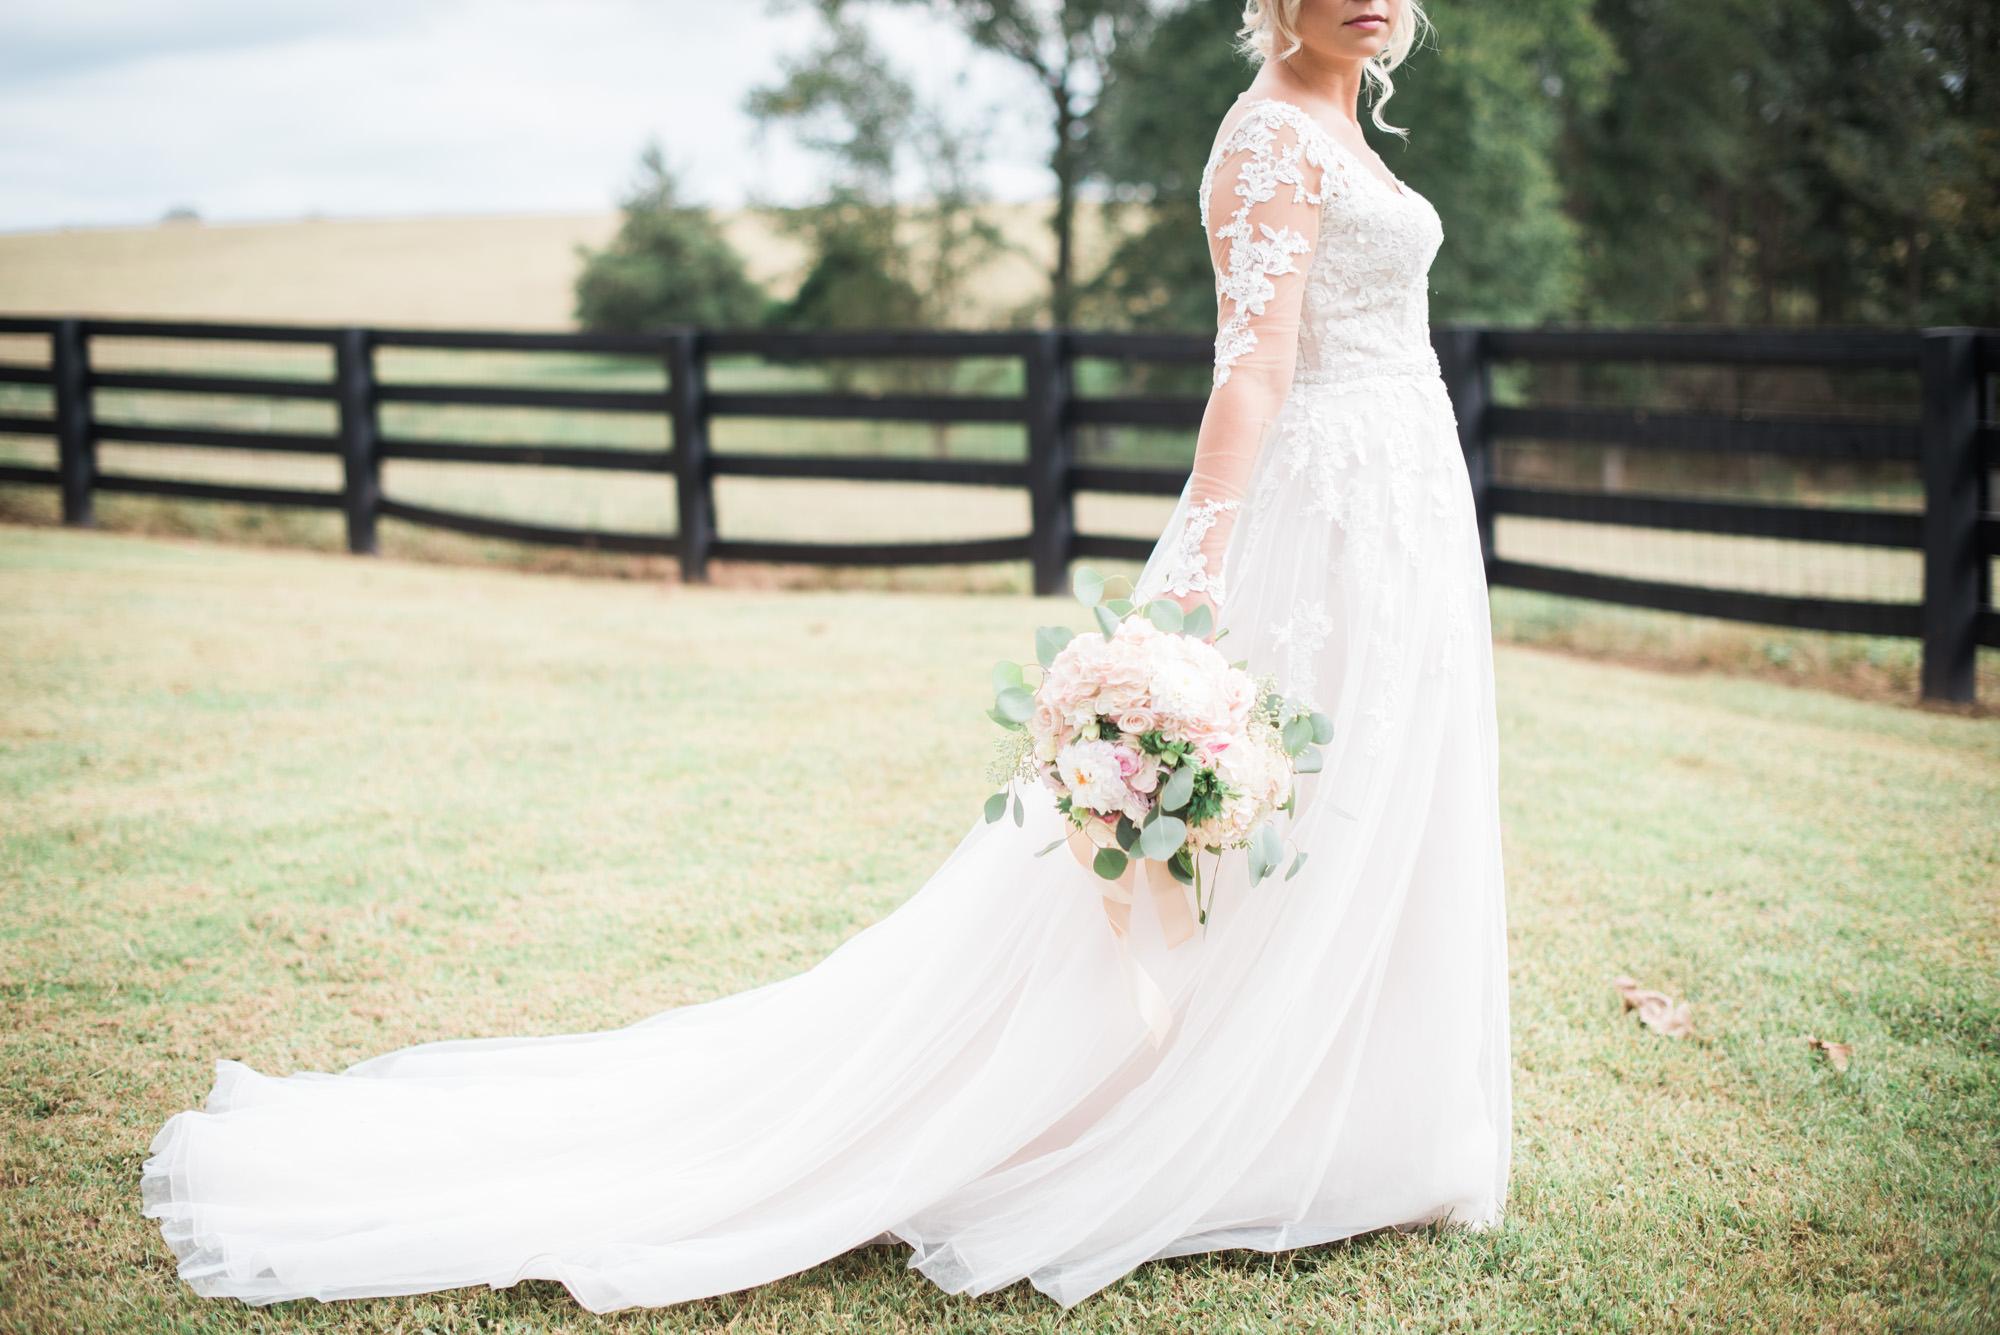 junebird-photography-wedding-photographer-12.jpg